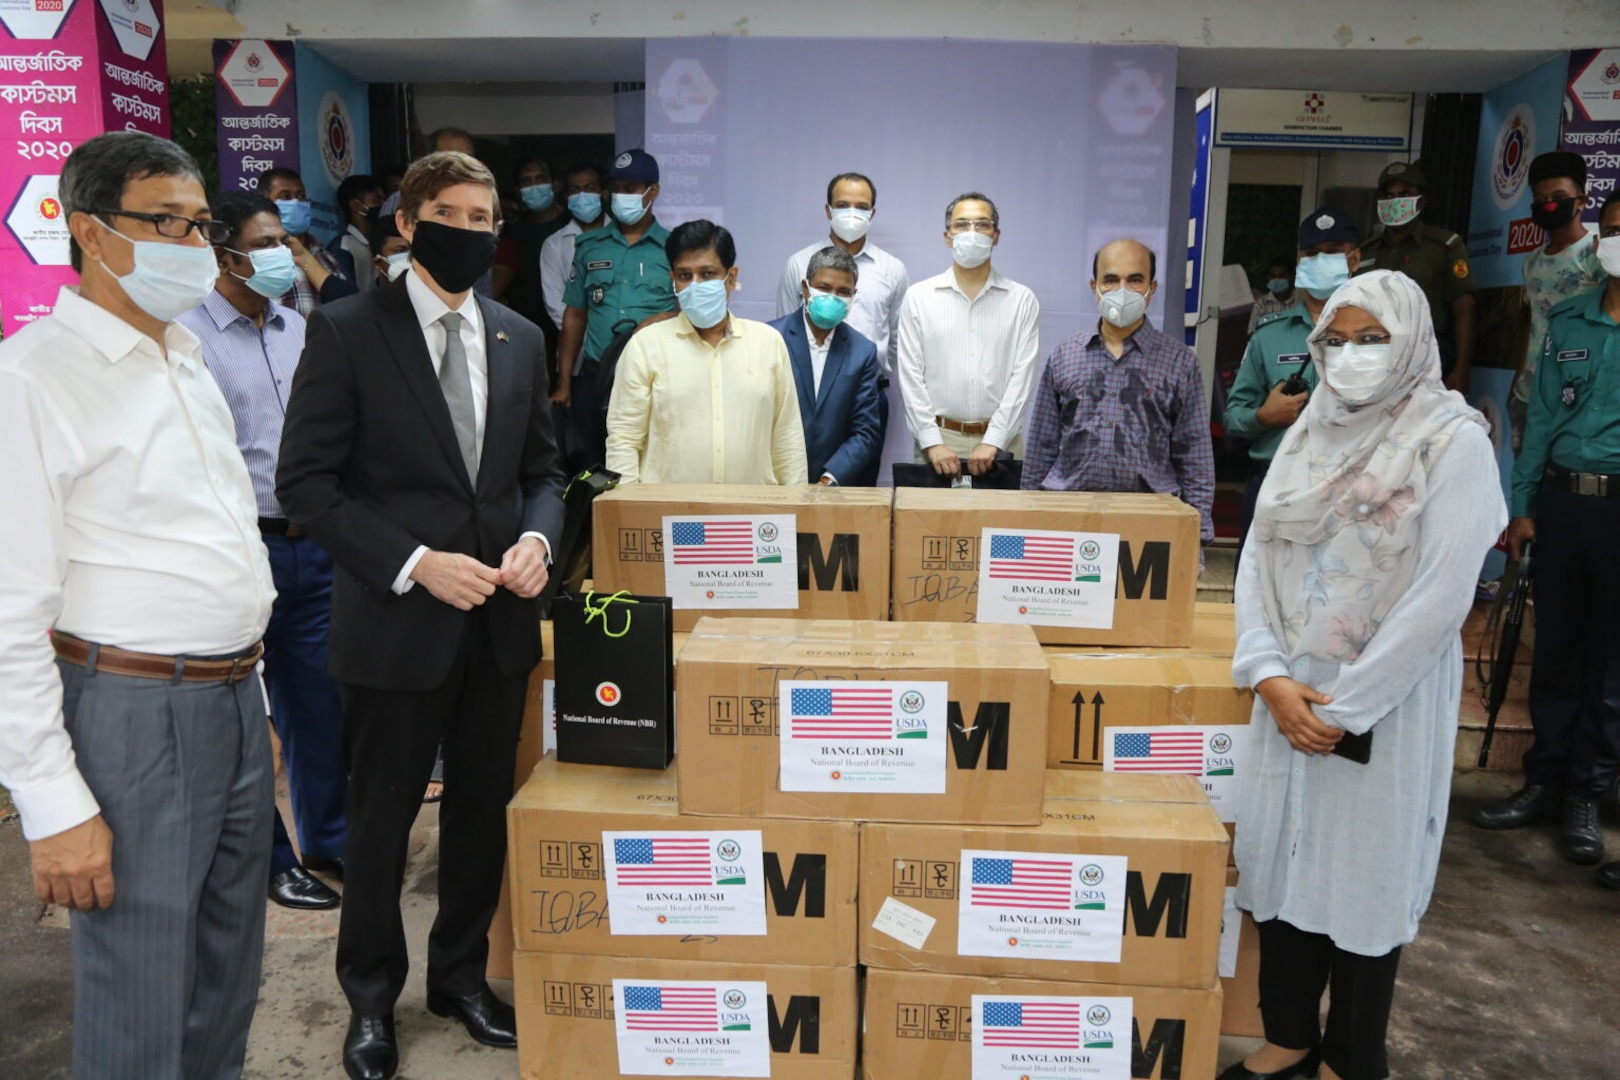 U.S. Embassy Provides COVID-19 Response Equipment to Bangladesh Customs Department